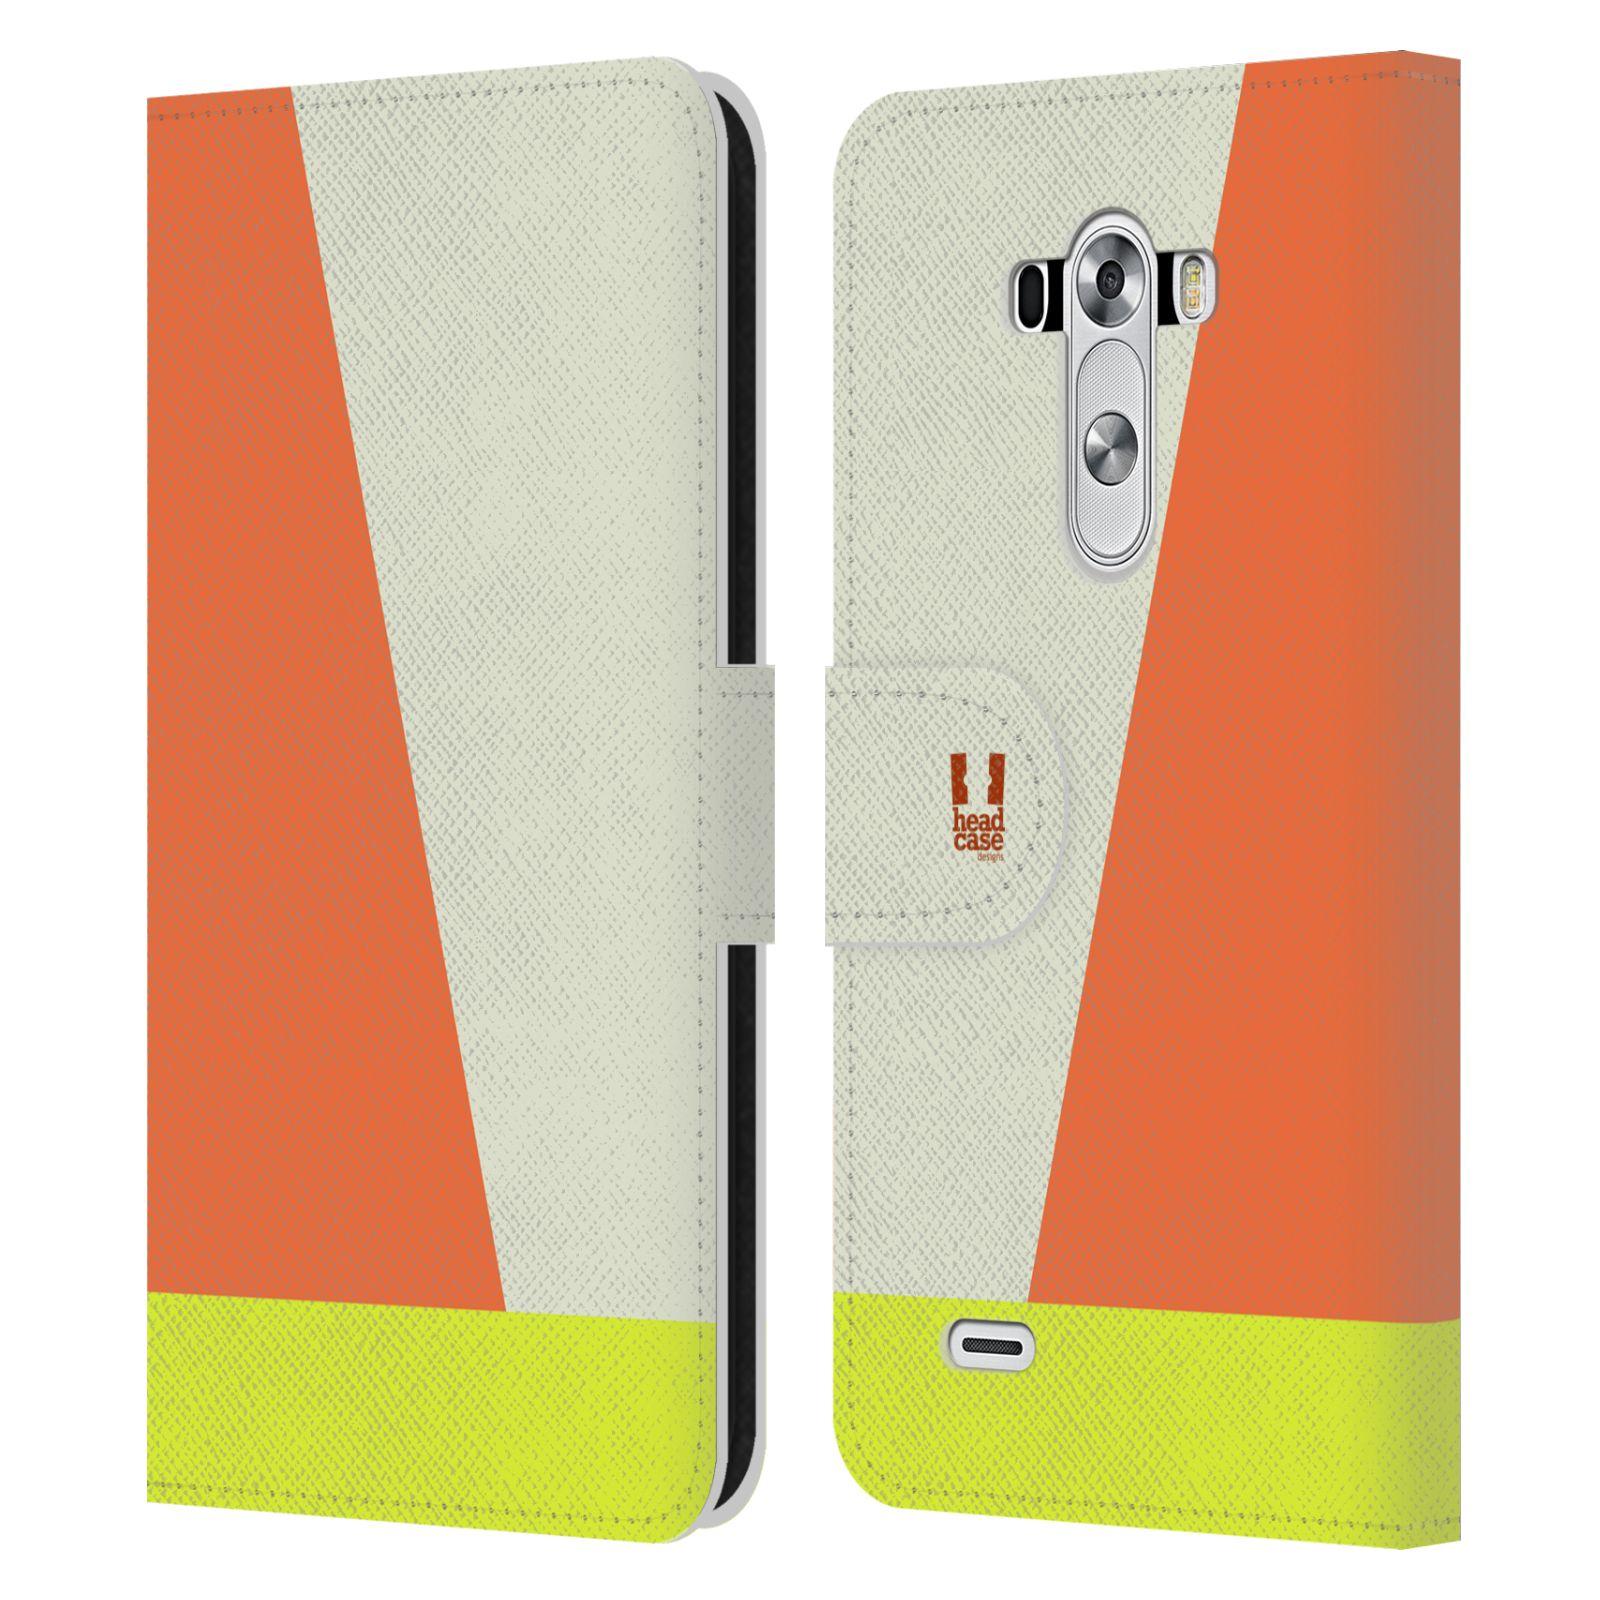 HEAD CASE Flipové pouzdro pro mobil LG G3 barevné tvary slonová kost